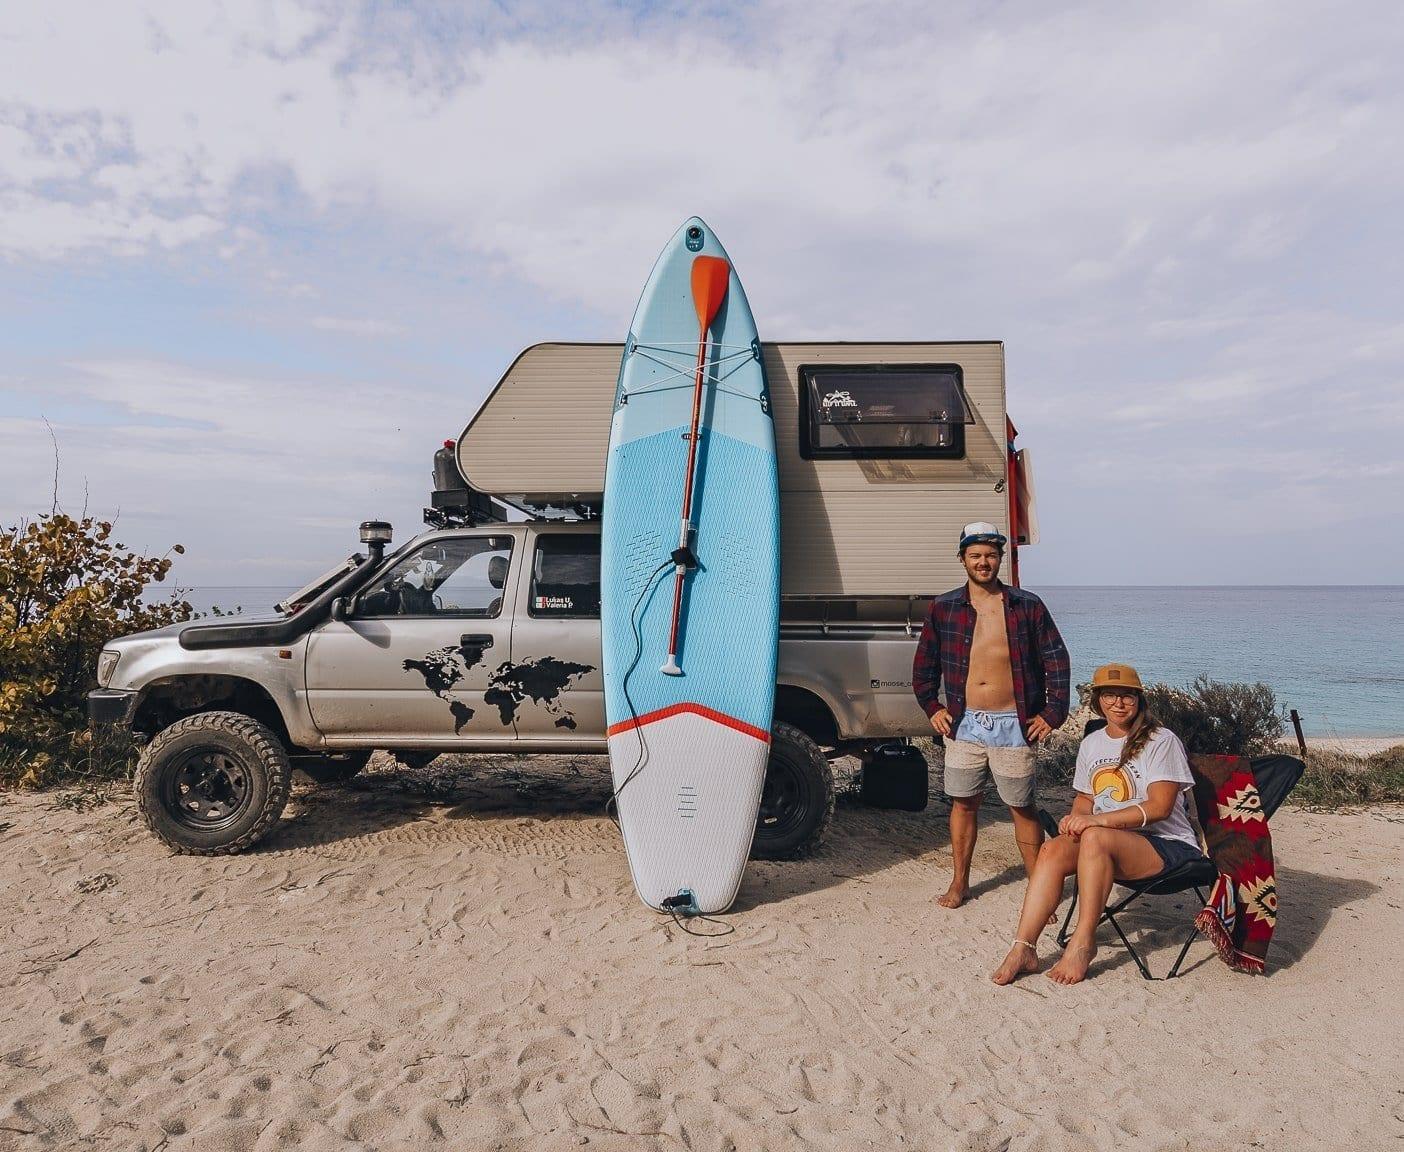 toyota-hilux-ln-105-camper-pickup-vanlife-kaufen-ausbau-1